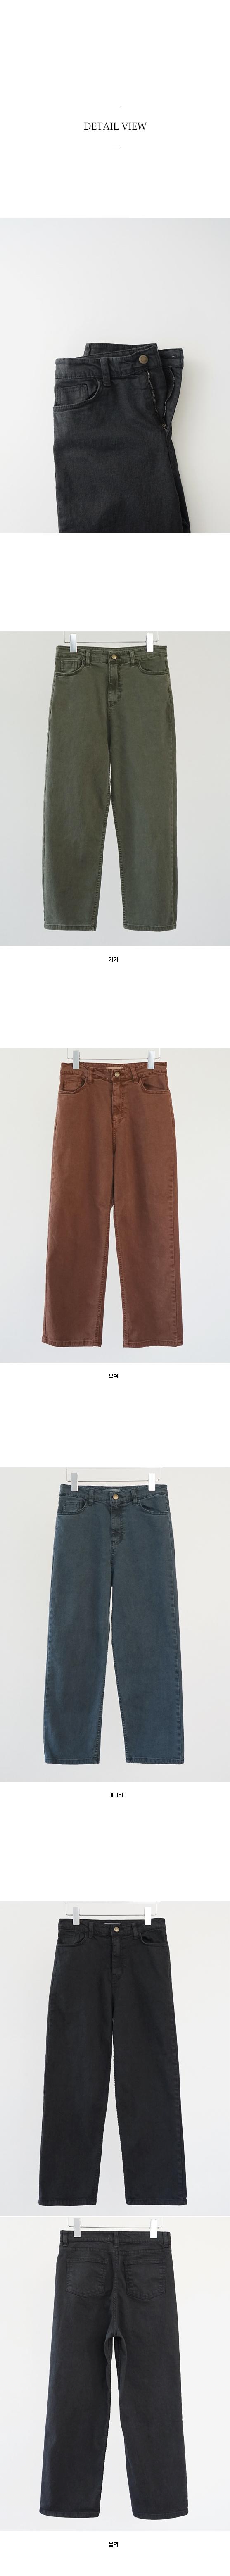 vintage color washing pants (4colors)